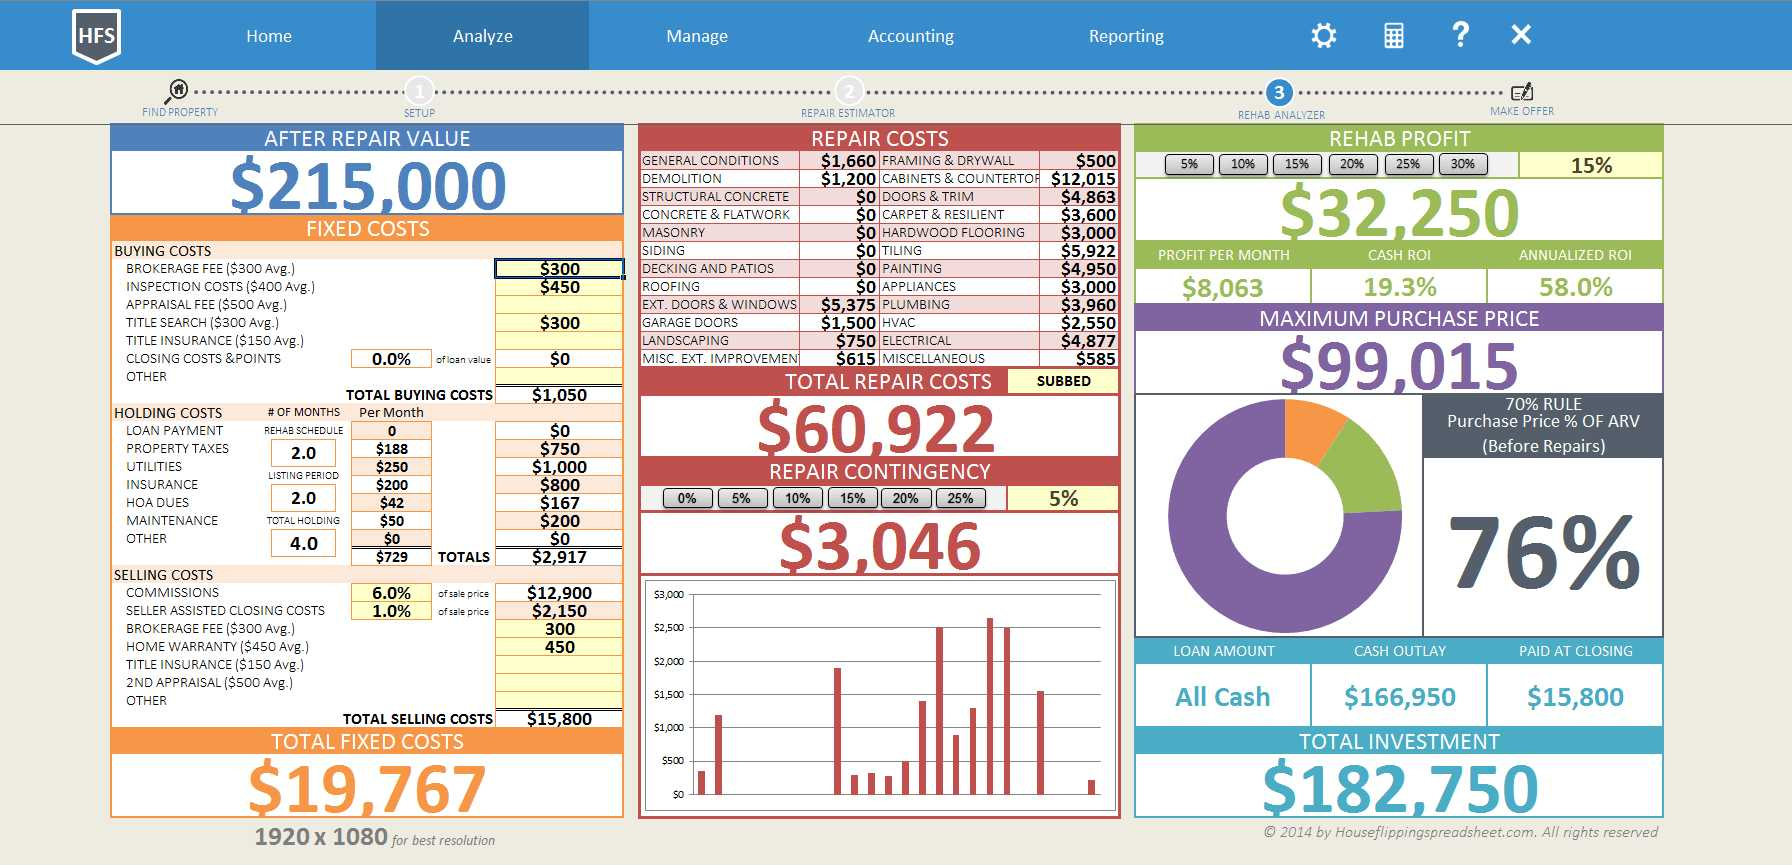 Flip Spreadsheet Excel Intended For Real Estate Flip Spreadsheet  Sosfuer Spreadsheet With House